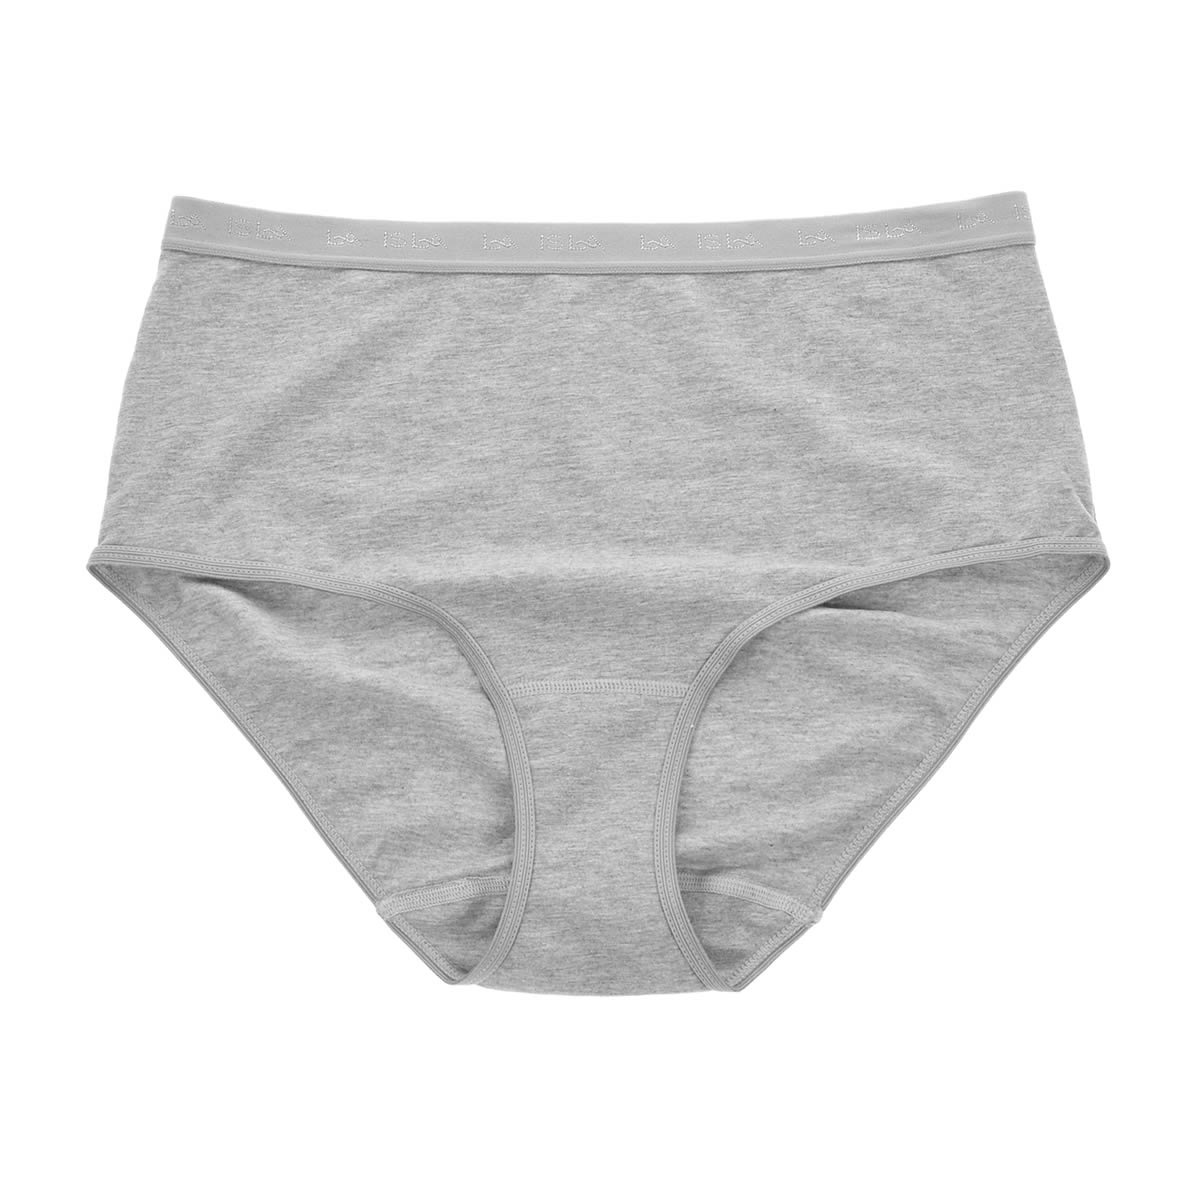 Women-039-s-Cotton-Light-Control-High-Waist-Plus-Size-Full-Brief-Panties